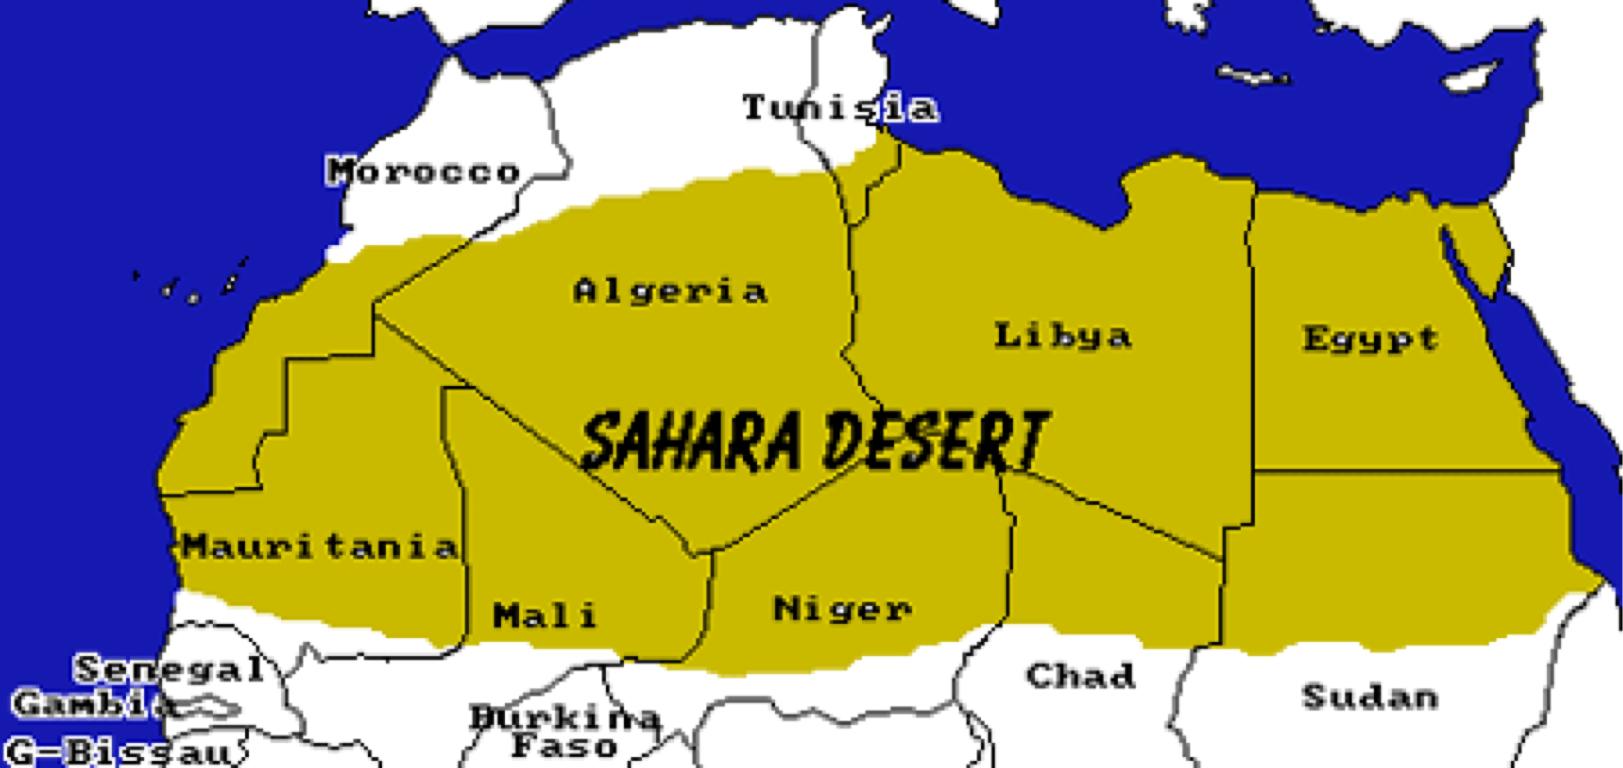 Map Of Africa Sahara Desert.Sahara Desert Location In Africa Map Biofocuscommunicatie